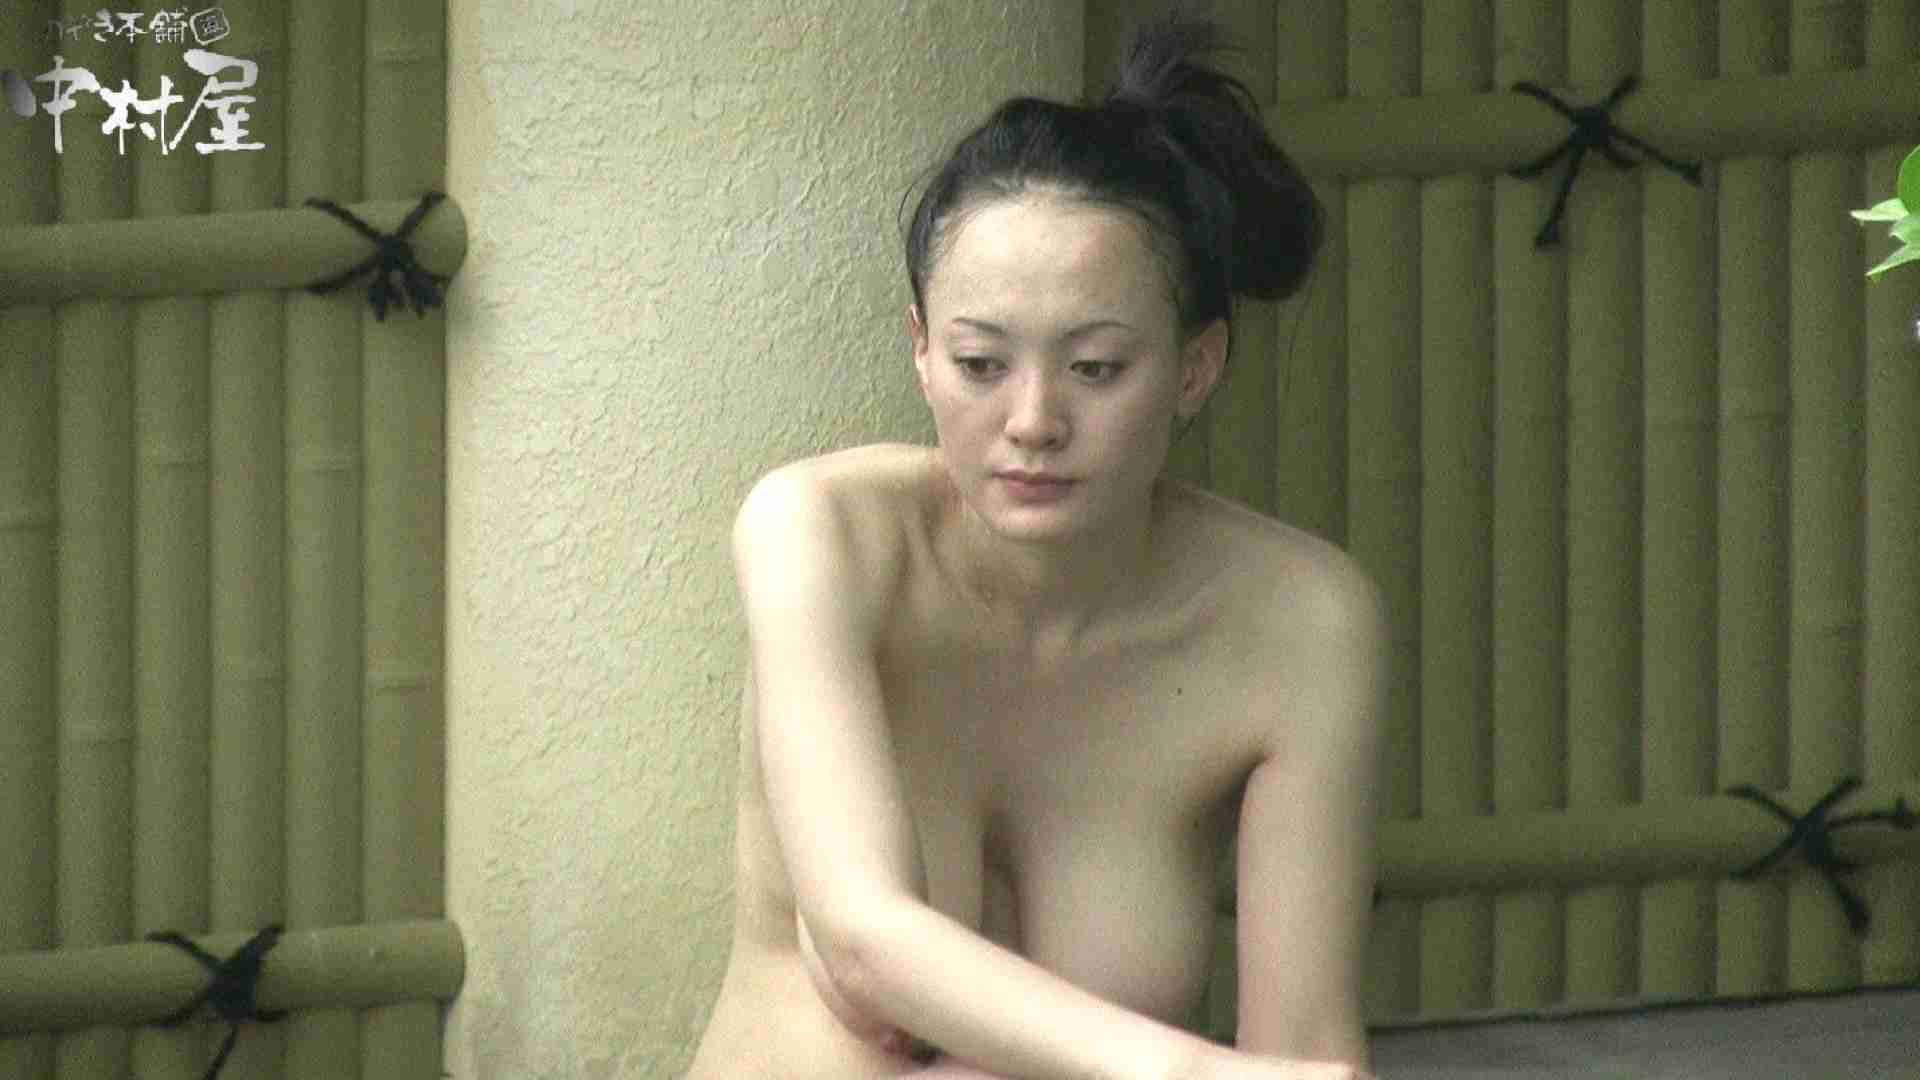 Aquaな露天風呂Vol.903 露天風呂編 | 盗撮シリーズ  81PIX 5